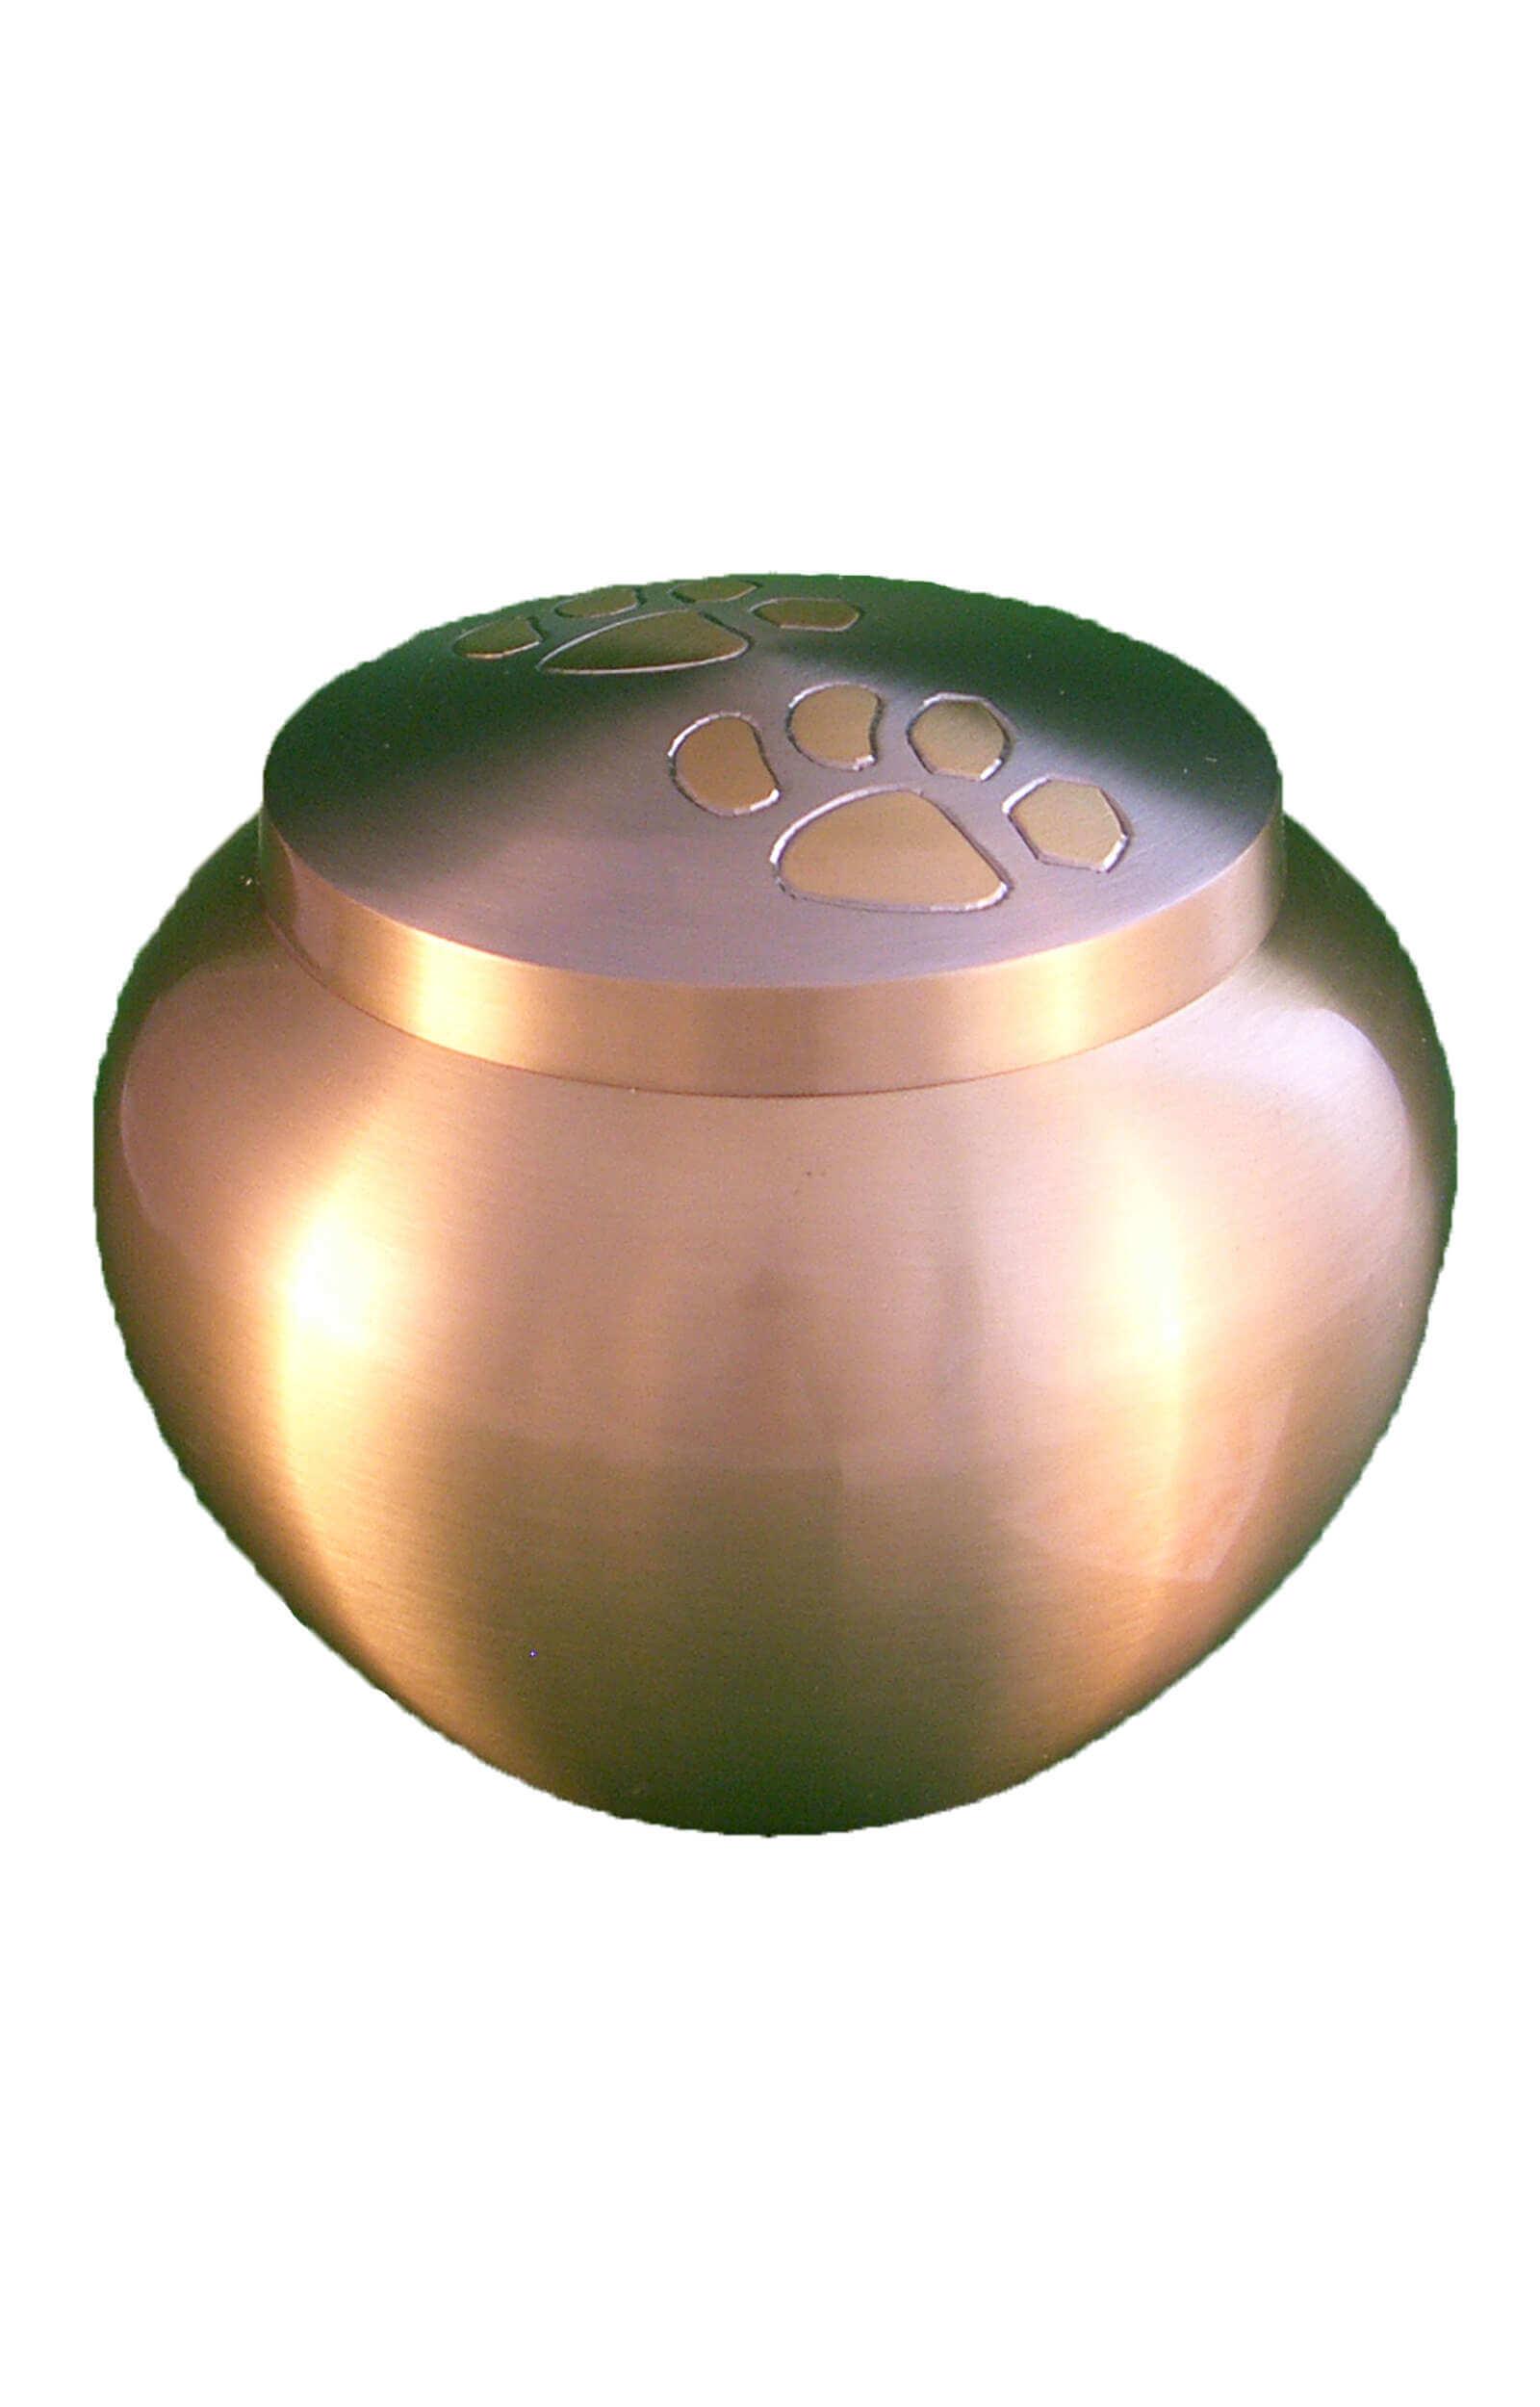 en.TIB1545AEL gold pawprint lid urn for pet ashes.jpg